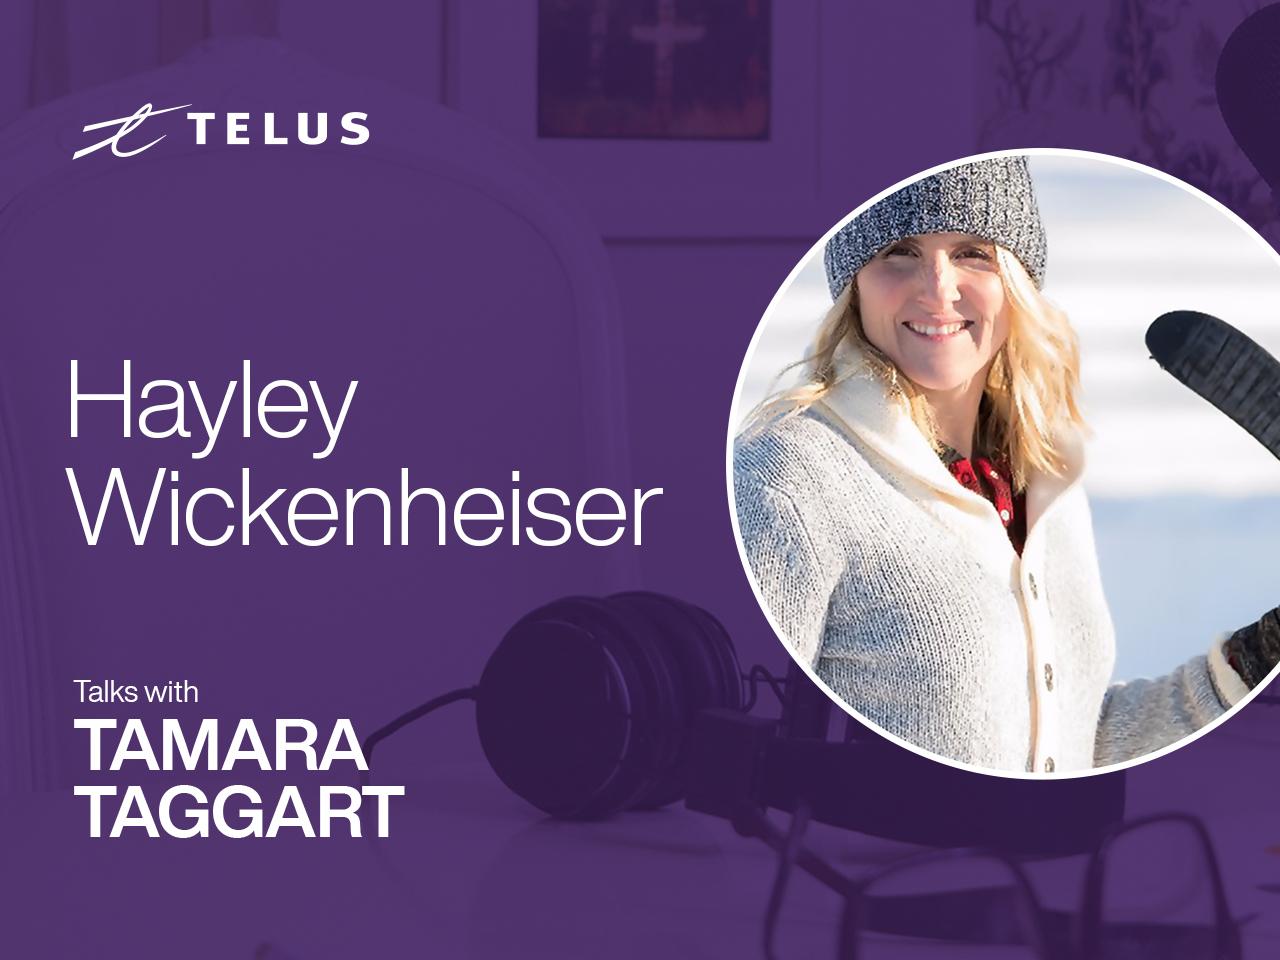 Olympic champion Hayley Wickenheiser